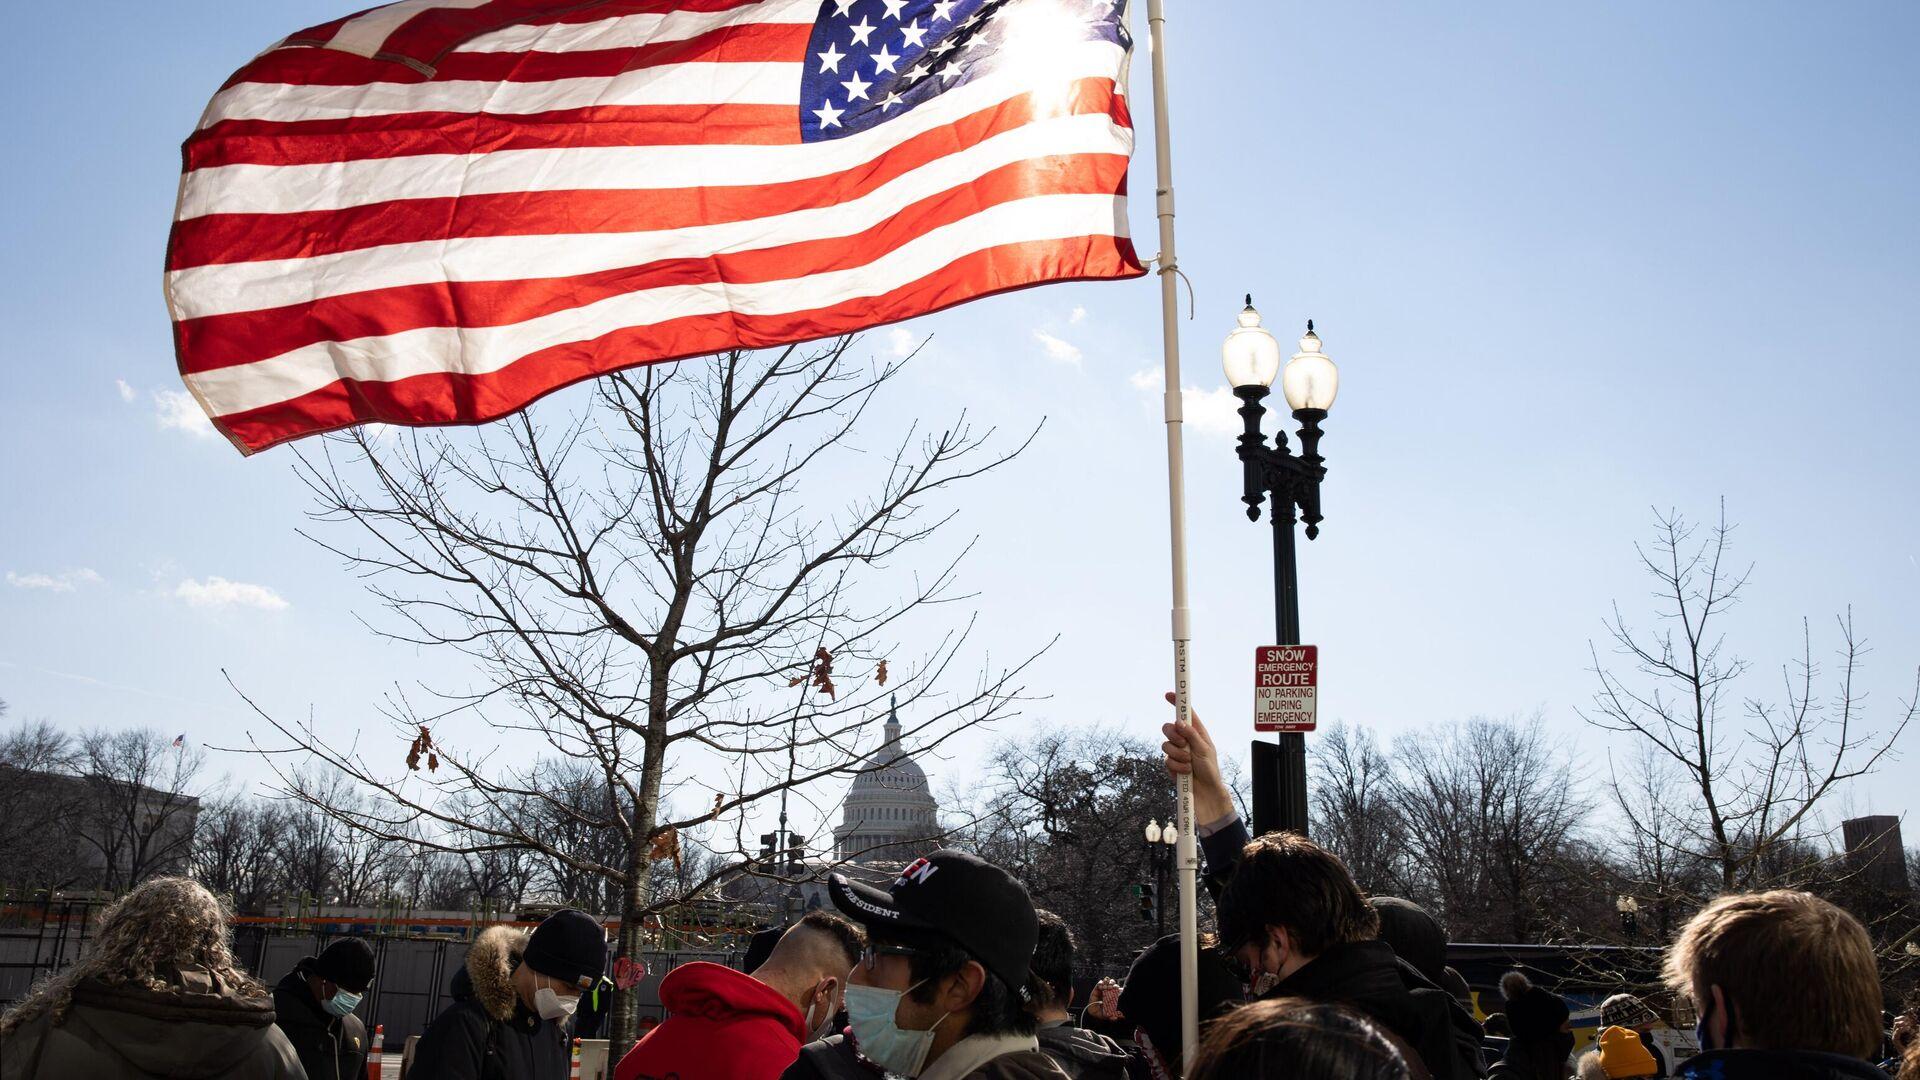 Американский флаг возле здания Капитолия США во время инаугурации избранного президента Джо Байдена - РИА Новости, 1920, 11.02.2021